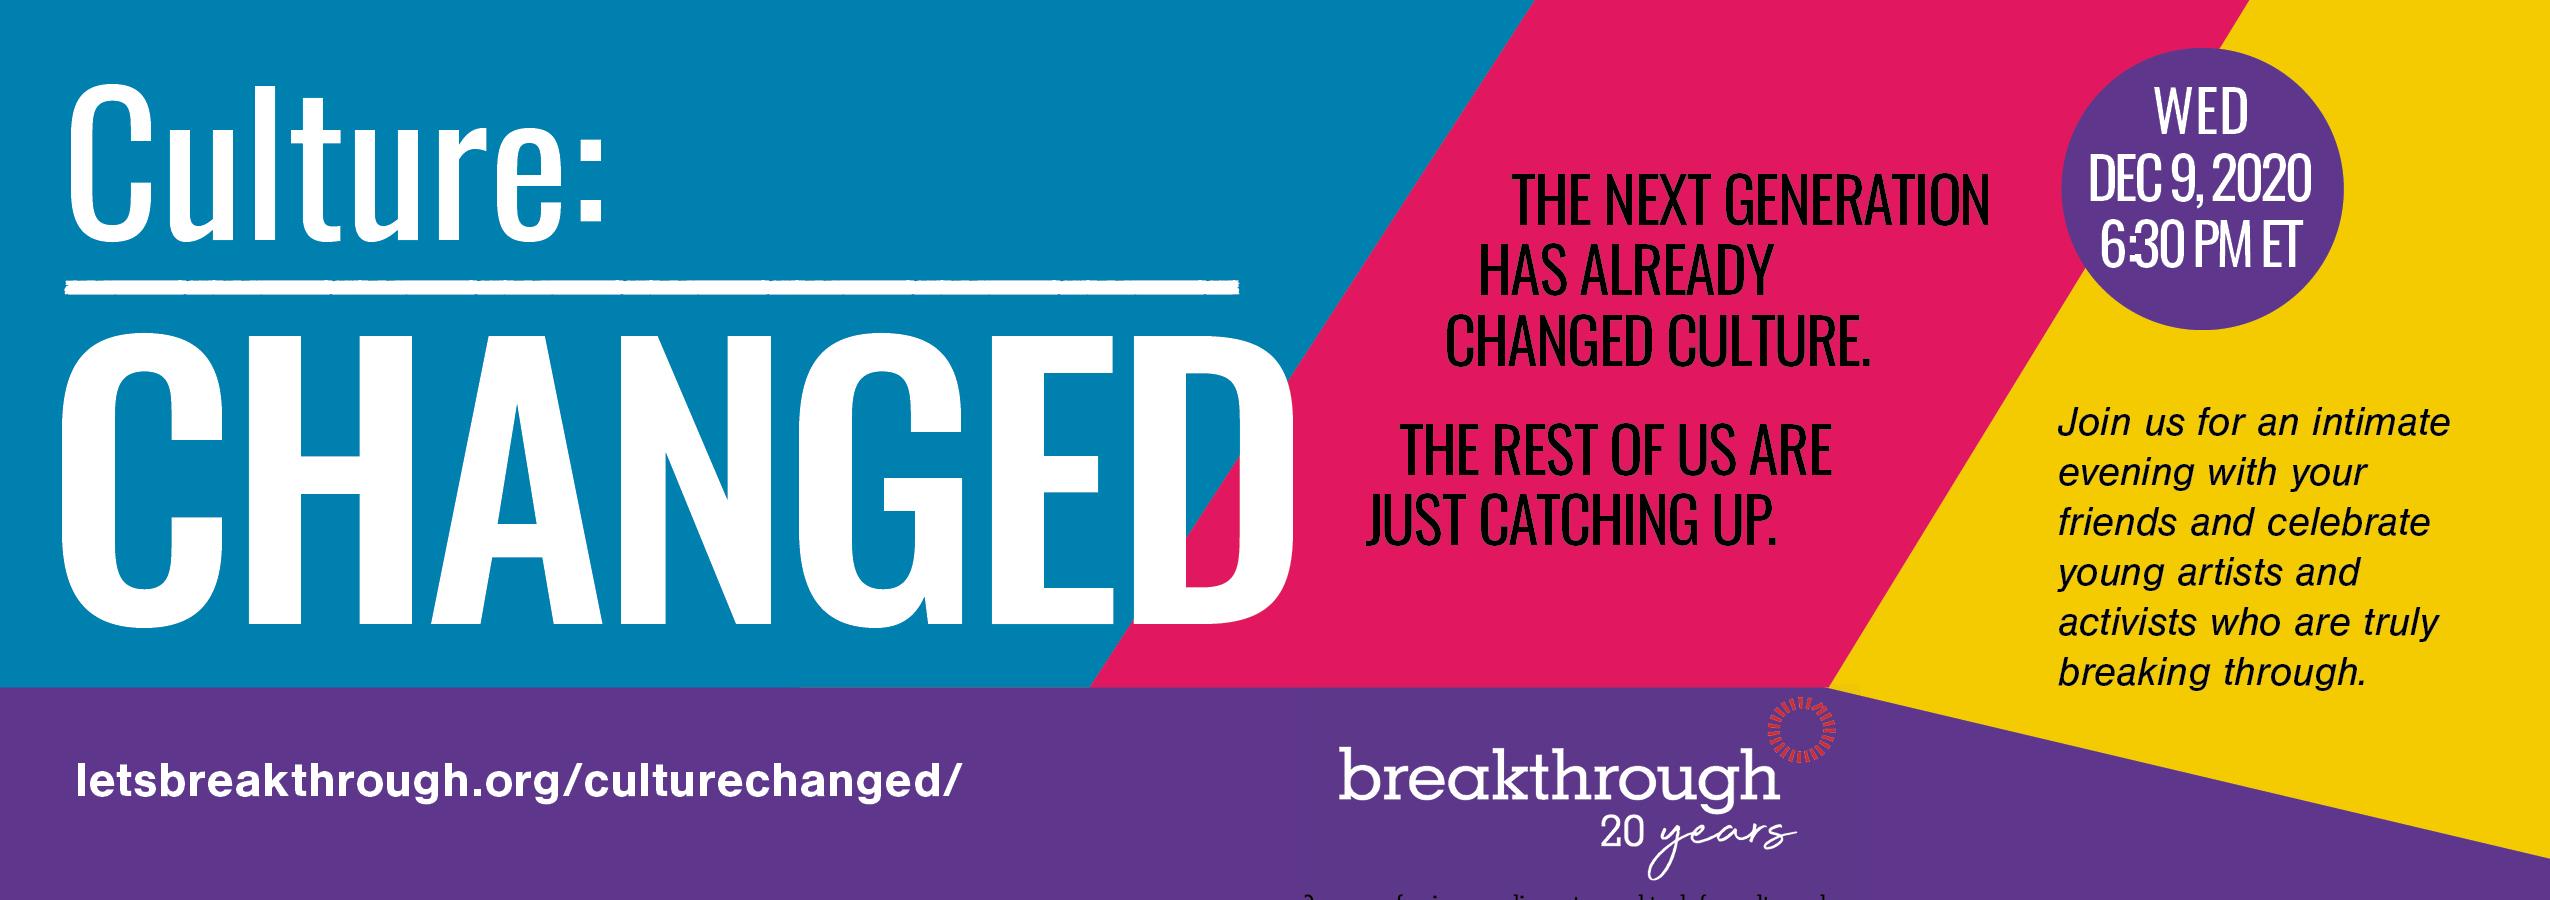 Breakthrough Virtual Event Invite